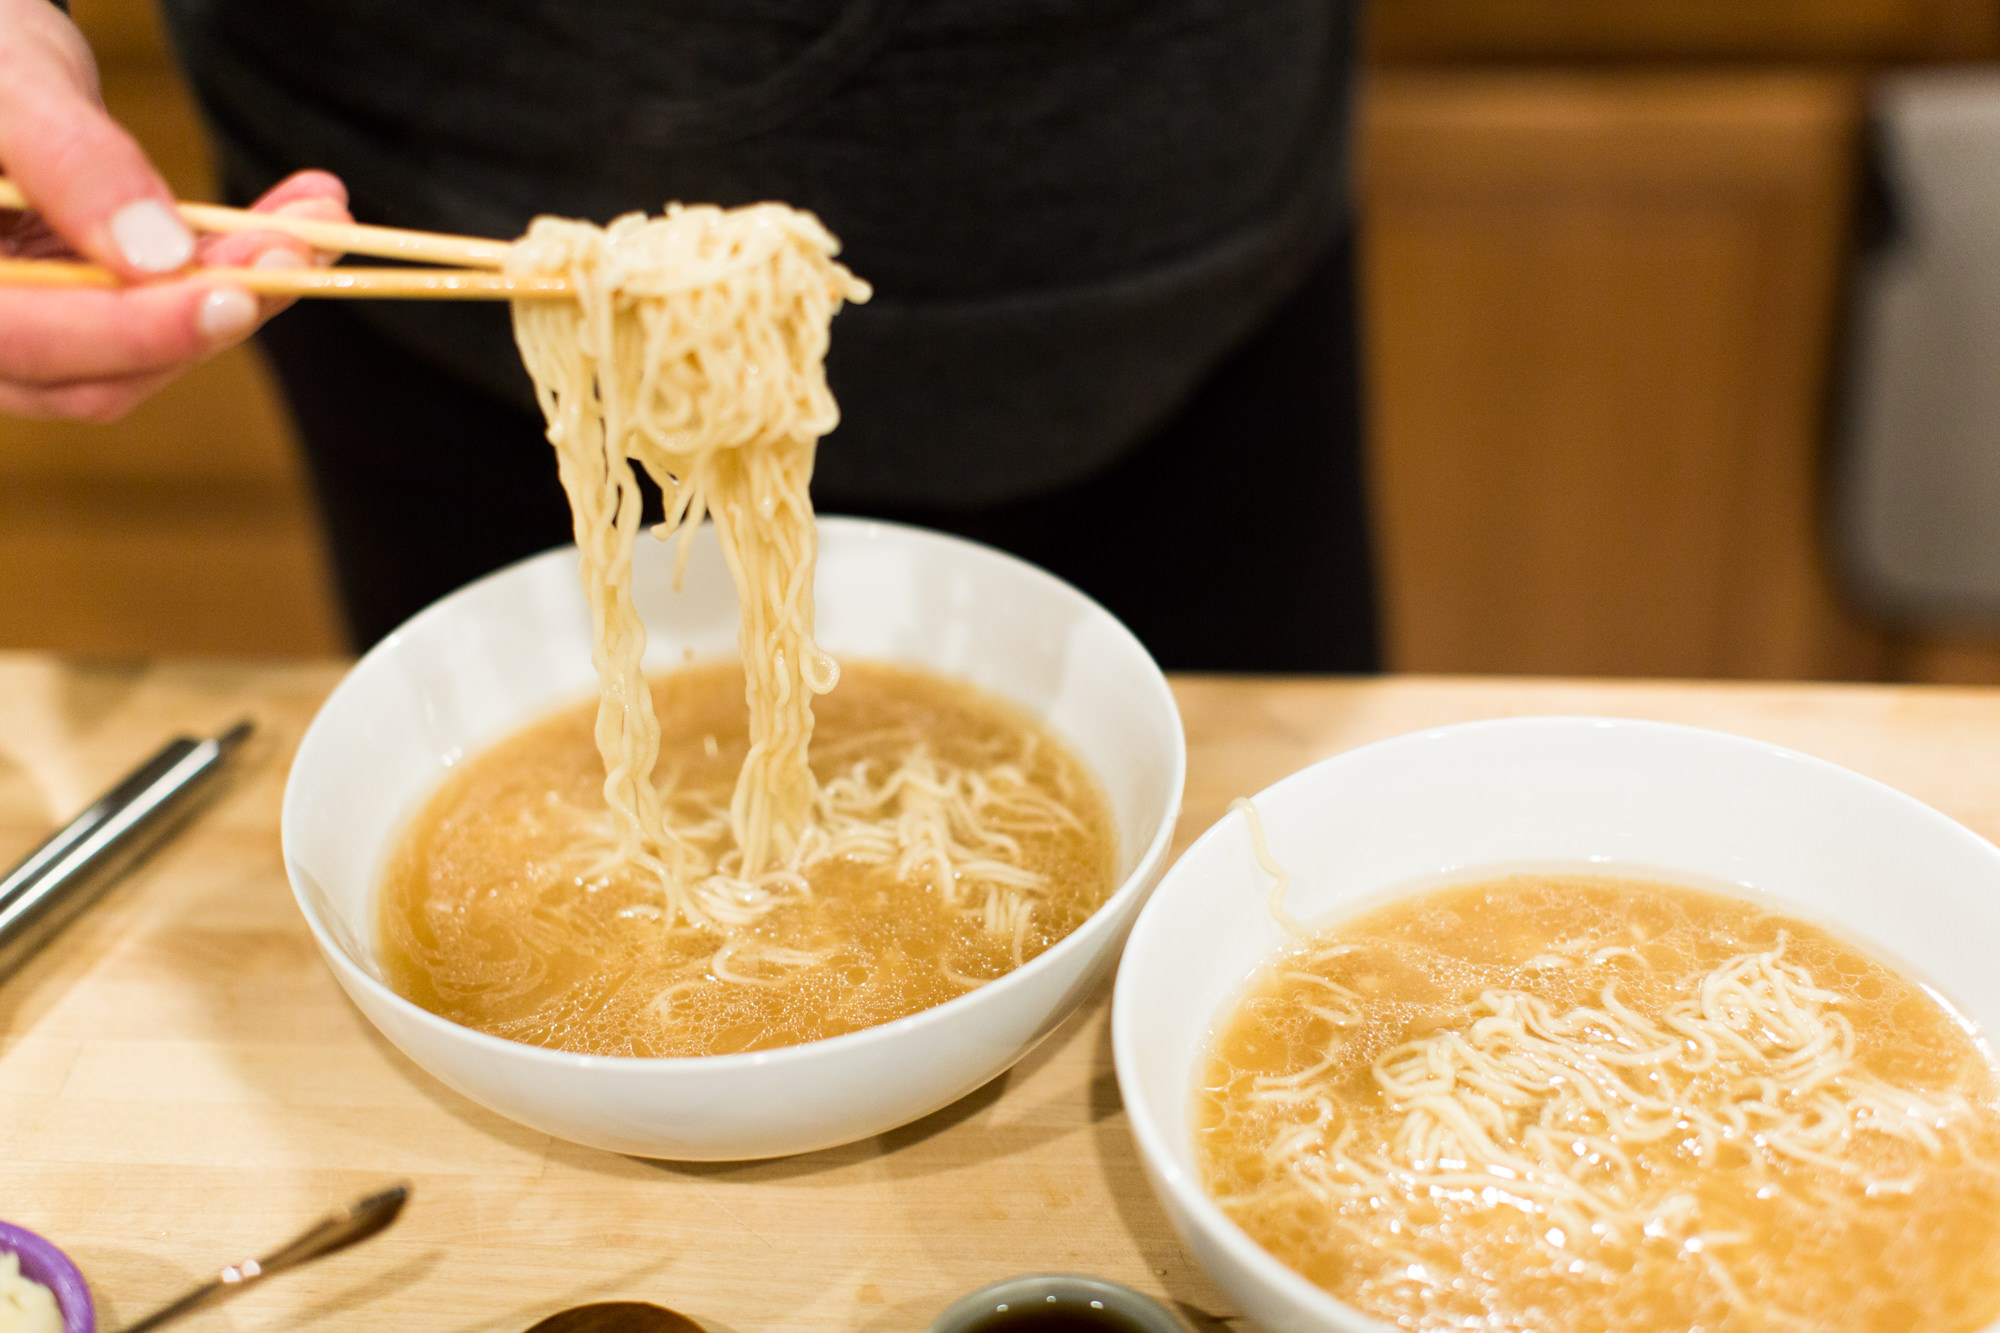 tonkotsu with fresh noodles